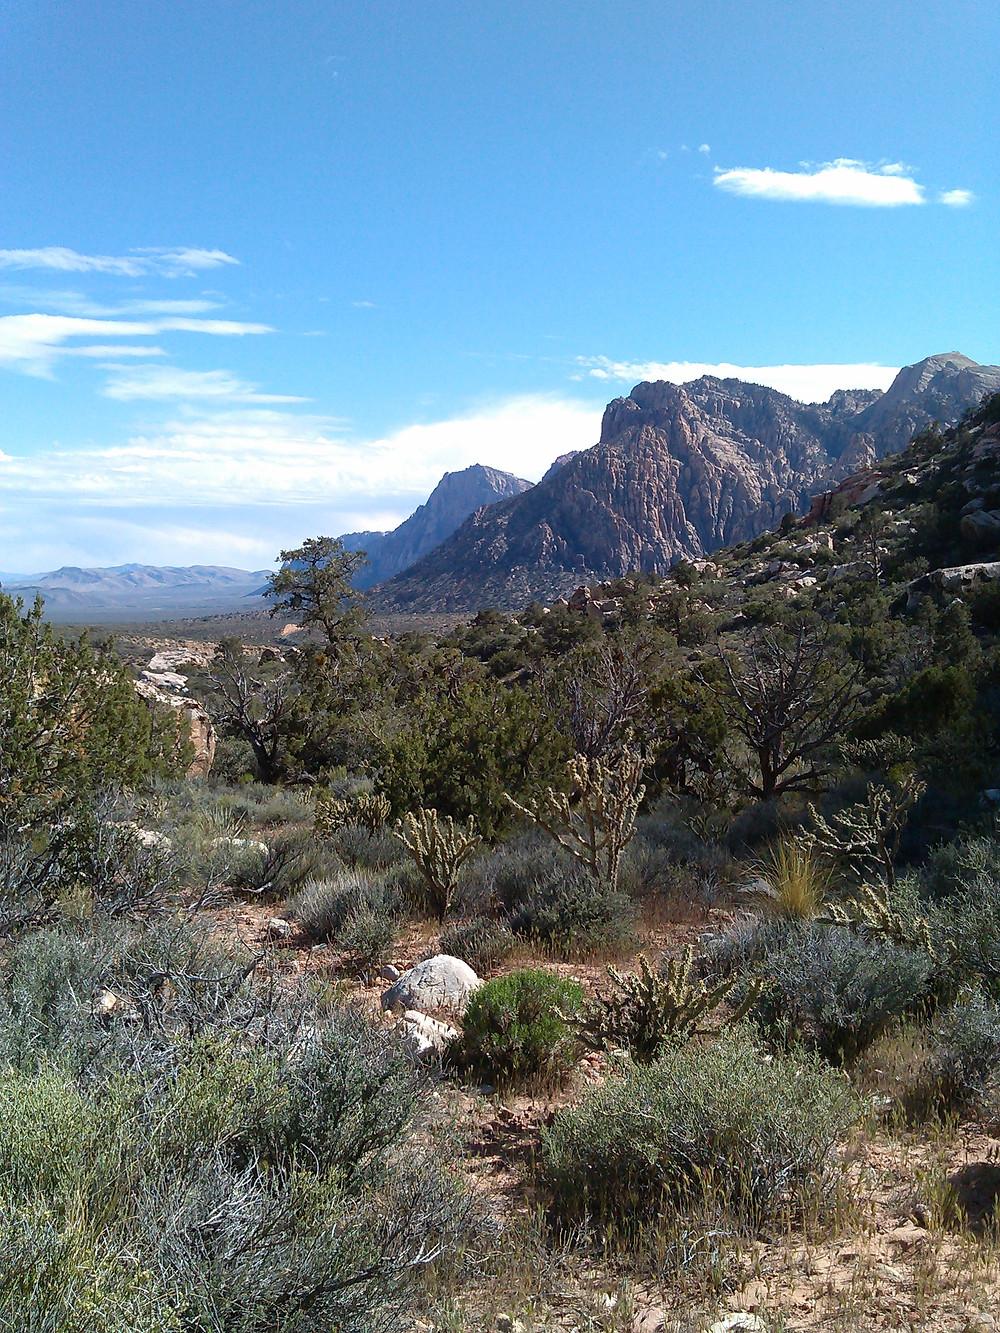 desert plants in front of red rock peaks